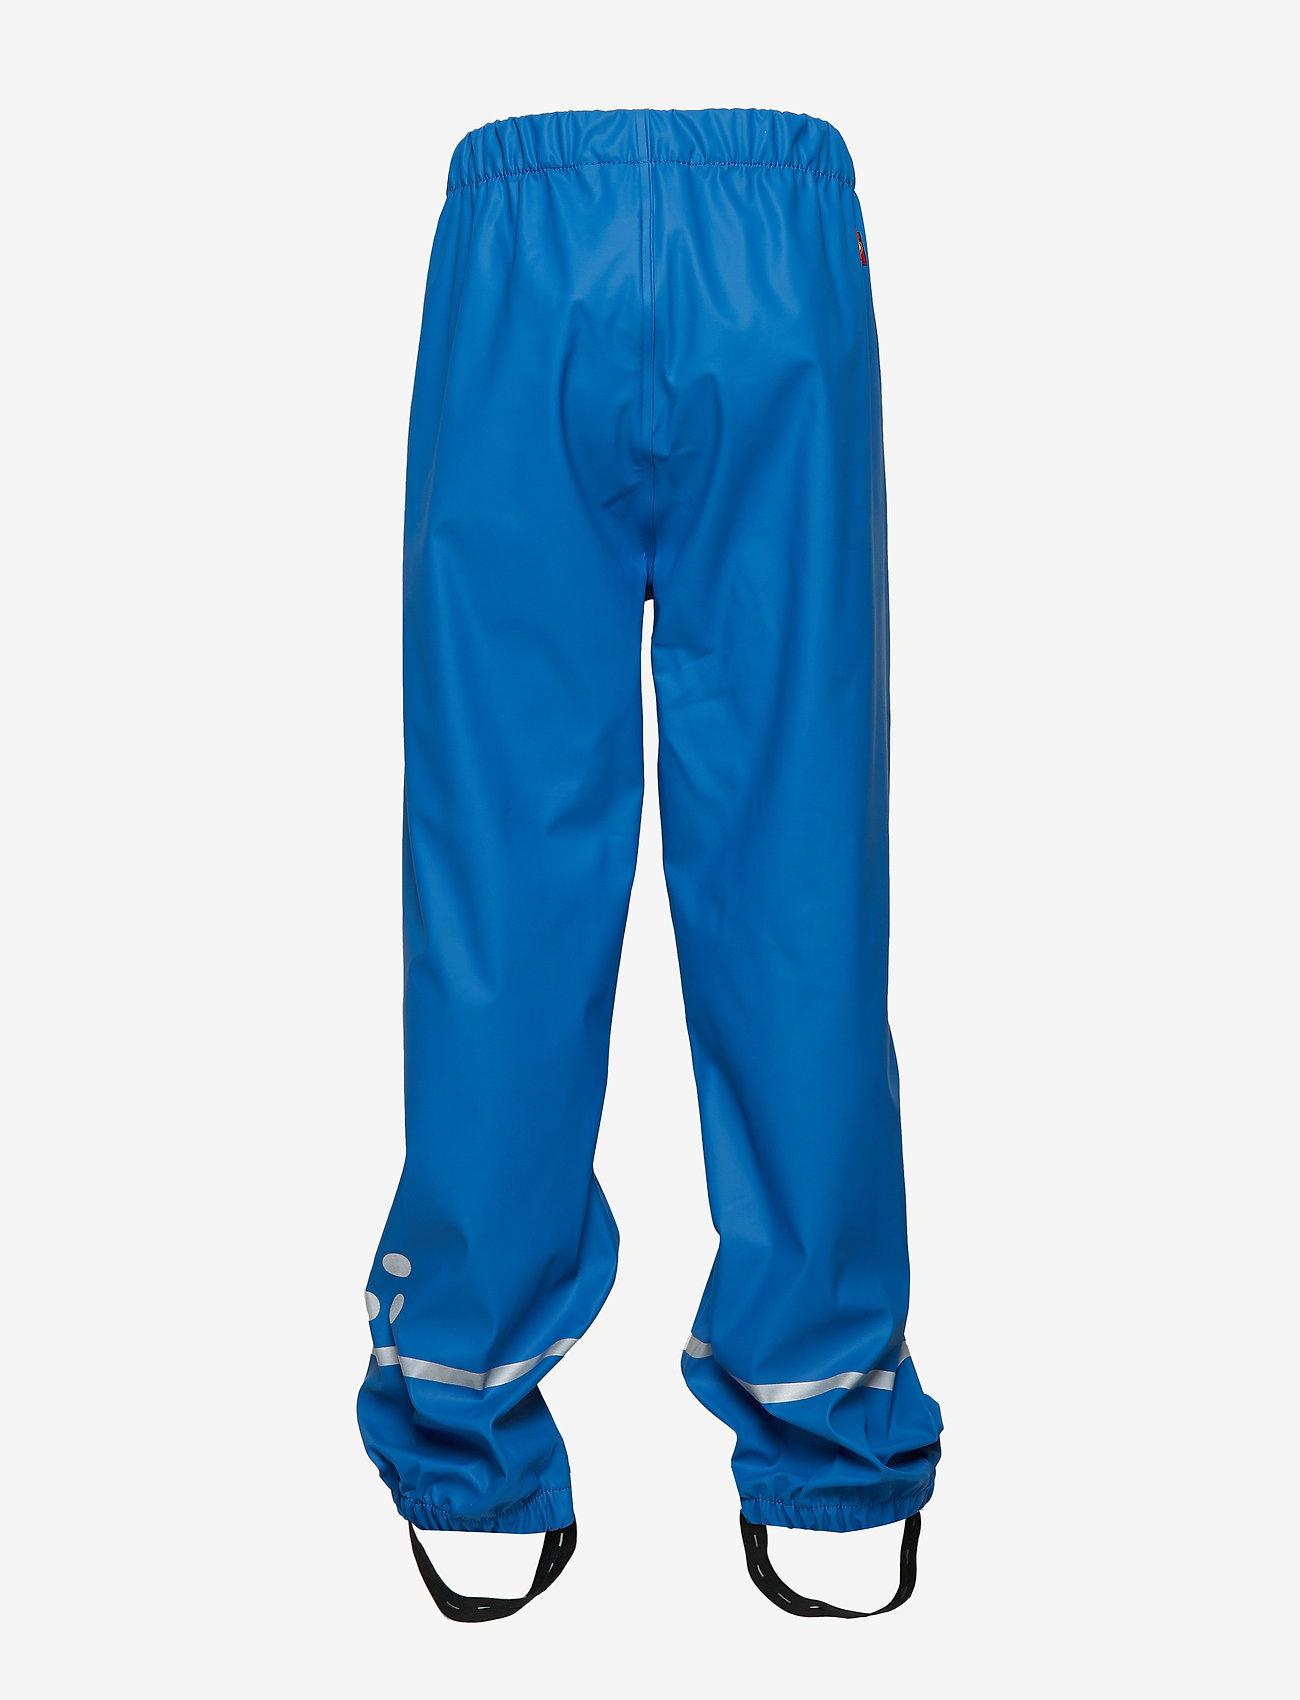 Lego wear - PUCK 101 - RAIN PANTS - pantalons - blue - 1